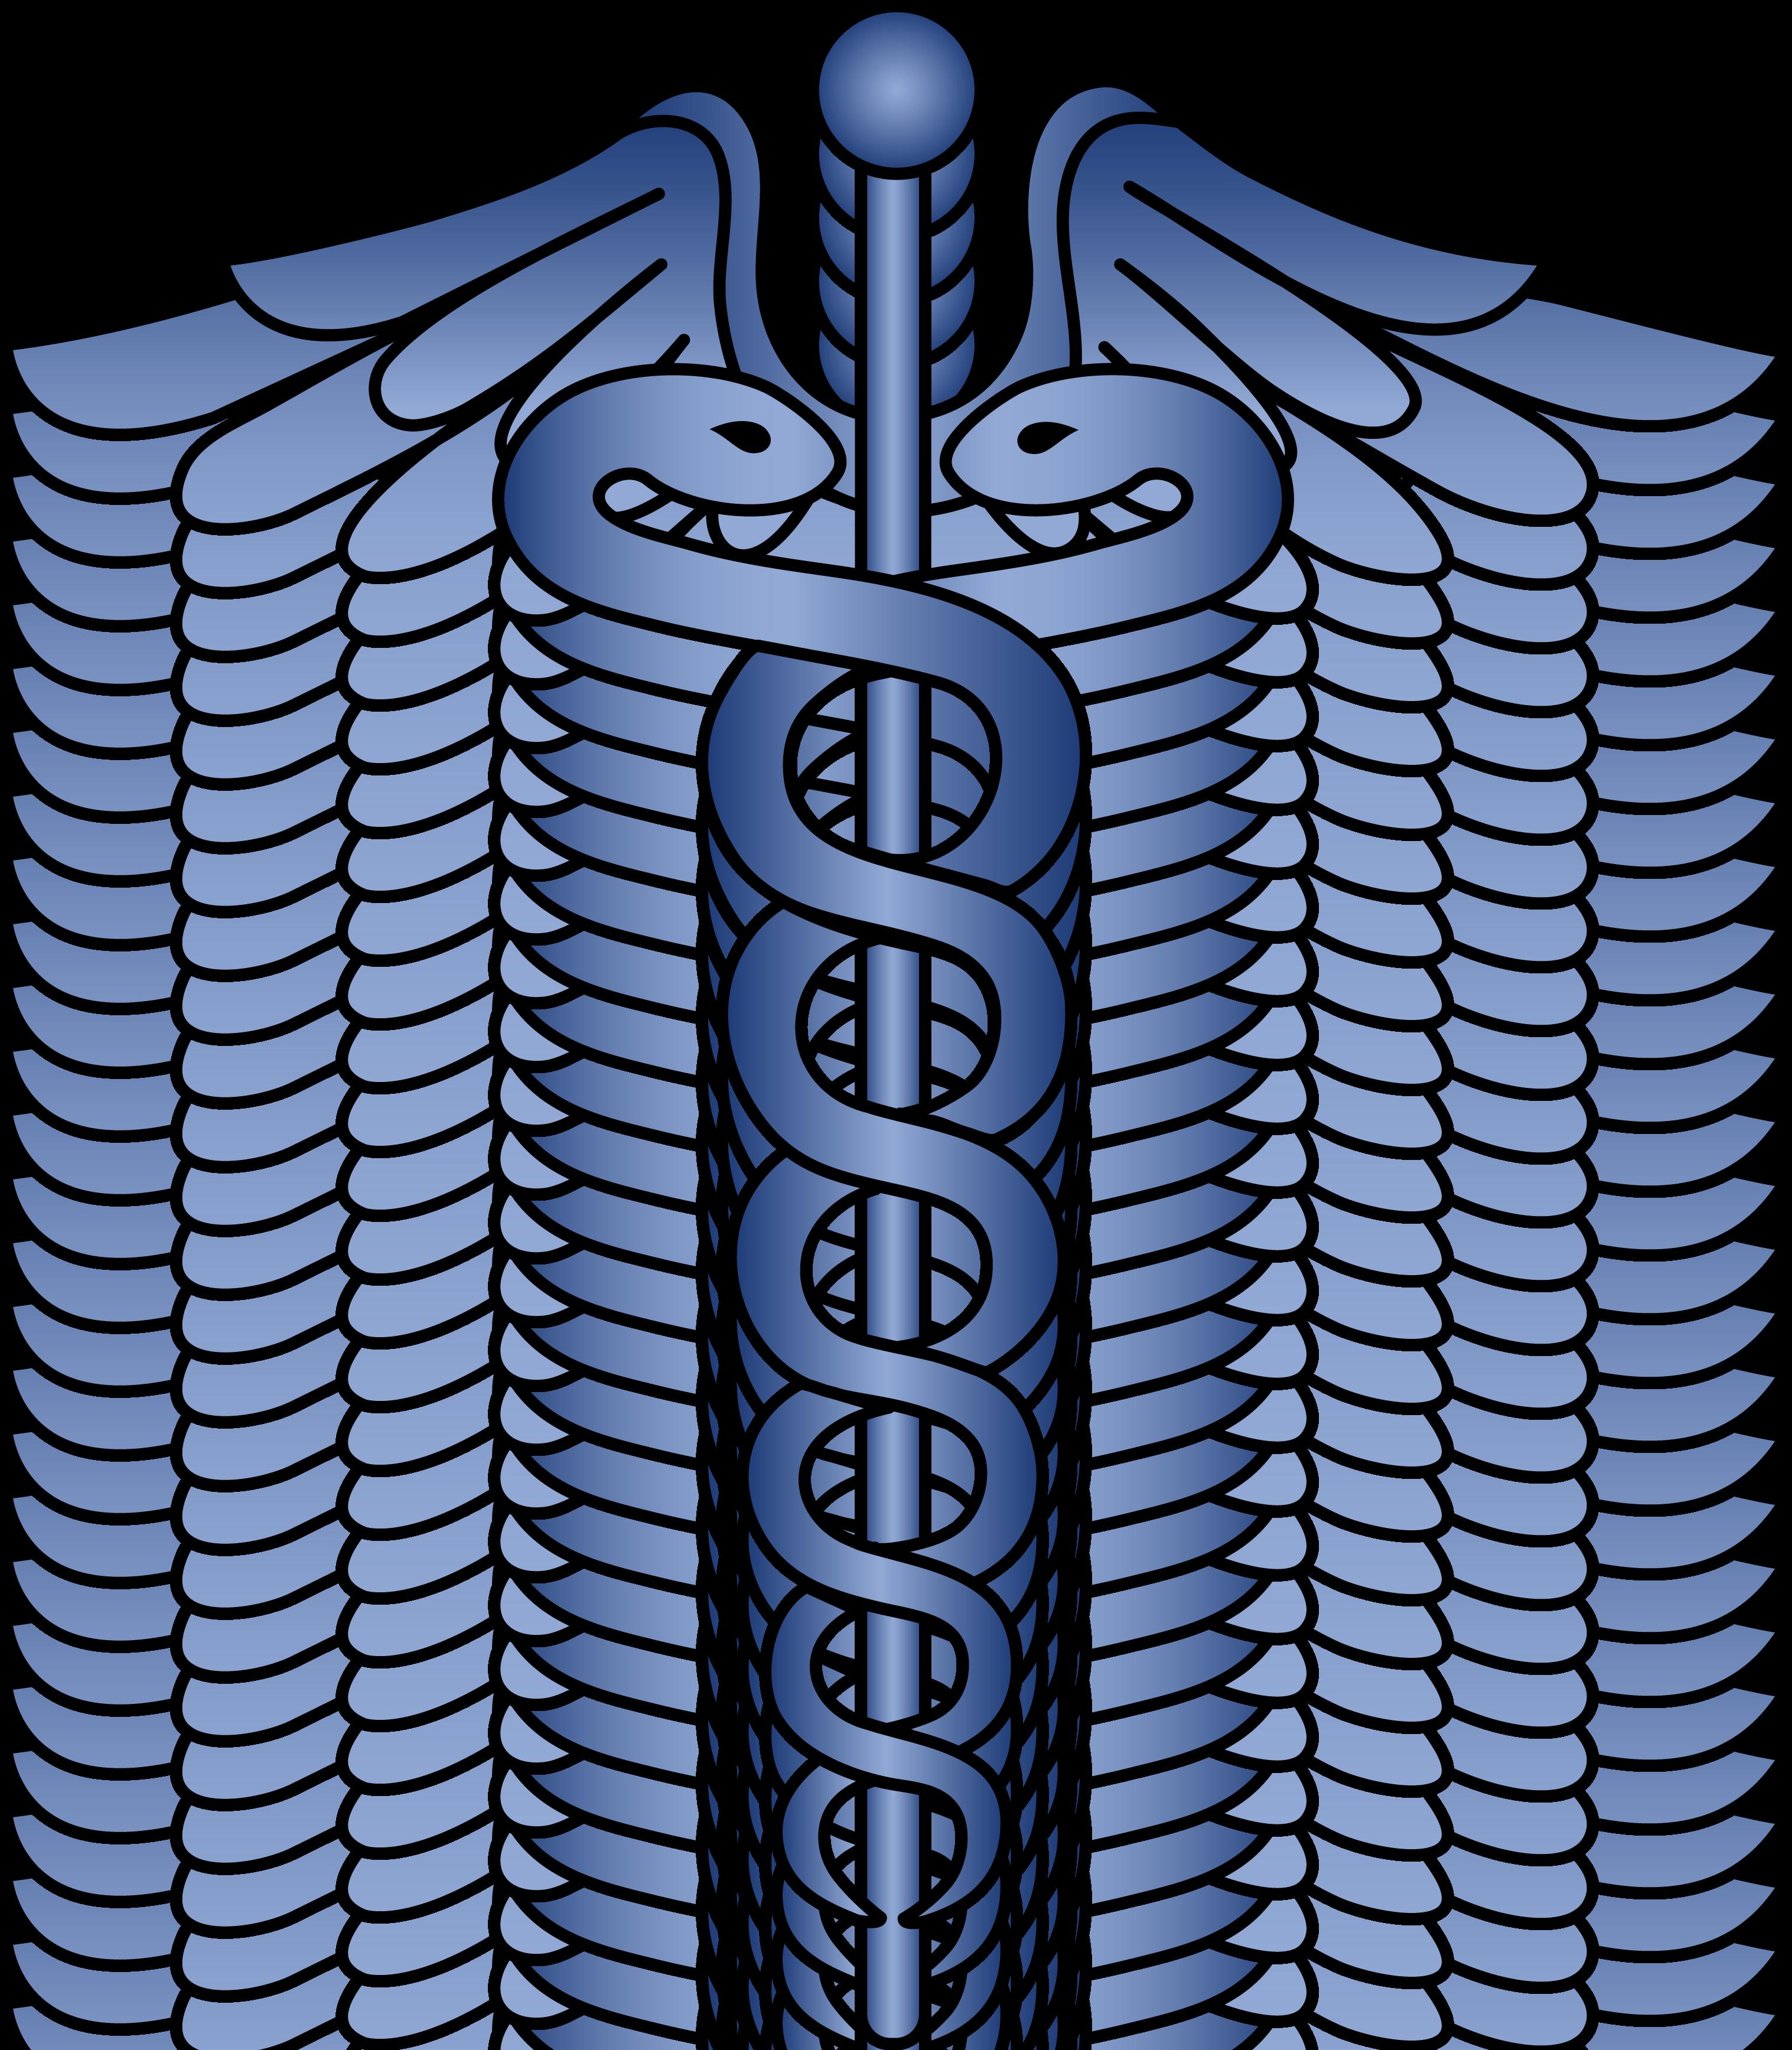 3034x3471 Medical Symbol Design Clipart Panda